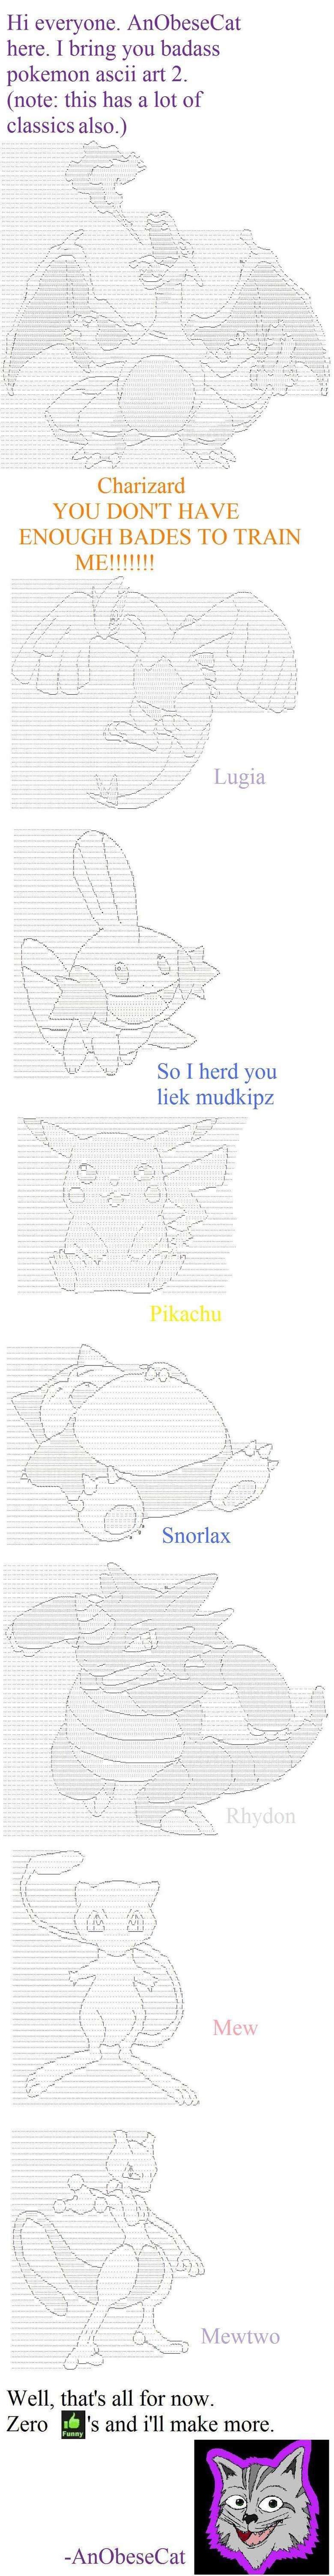 "Badass pokemon ASCII art part 2. part one vvvv<br /> <a href=""pictures/482215/Badass+pokemon+ASCII+art/"" target=blank>funnyjunk.com/funny_"